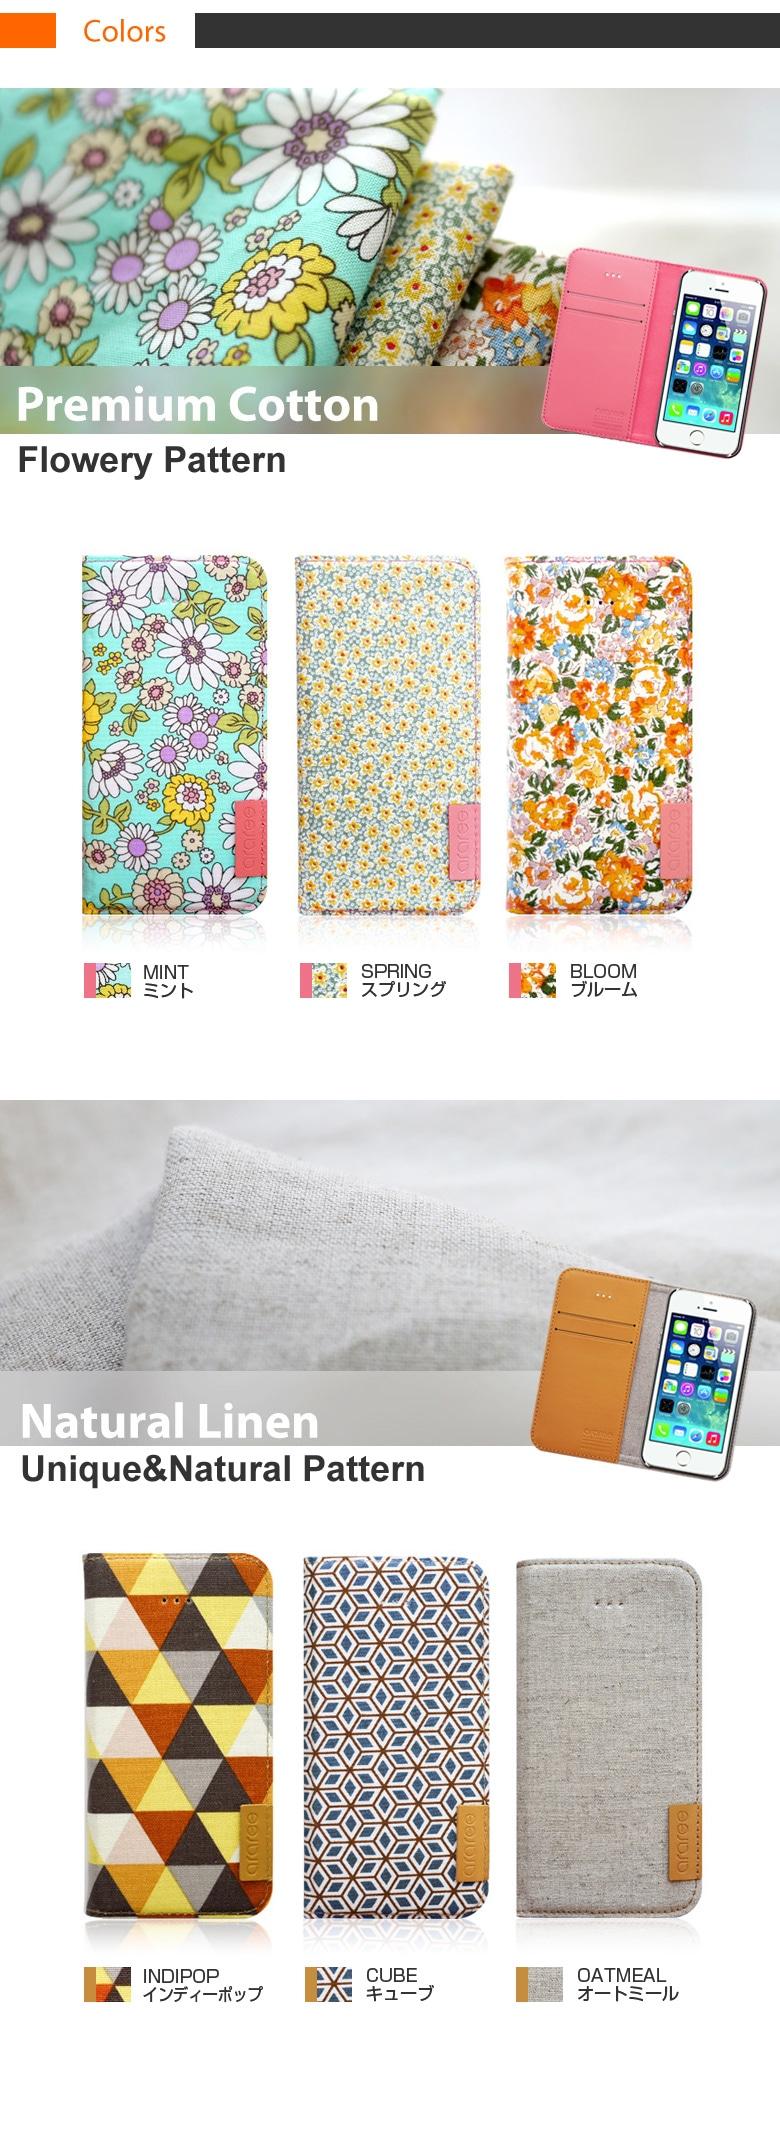 ���顼�Хꥨ������� iPhone5/5s ������Blossom Diary (�֥�å���������)